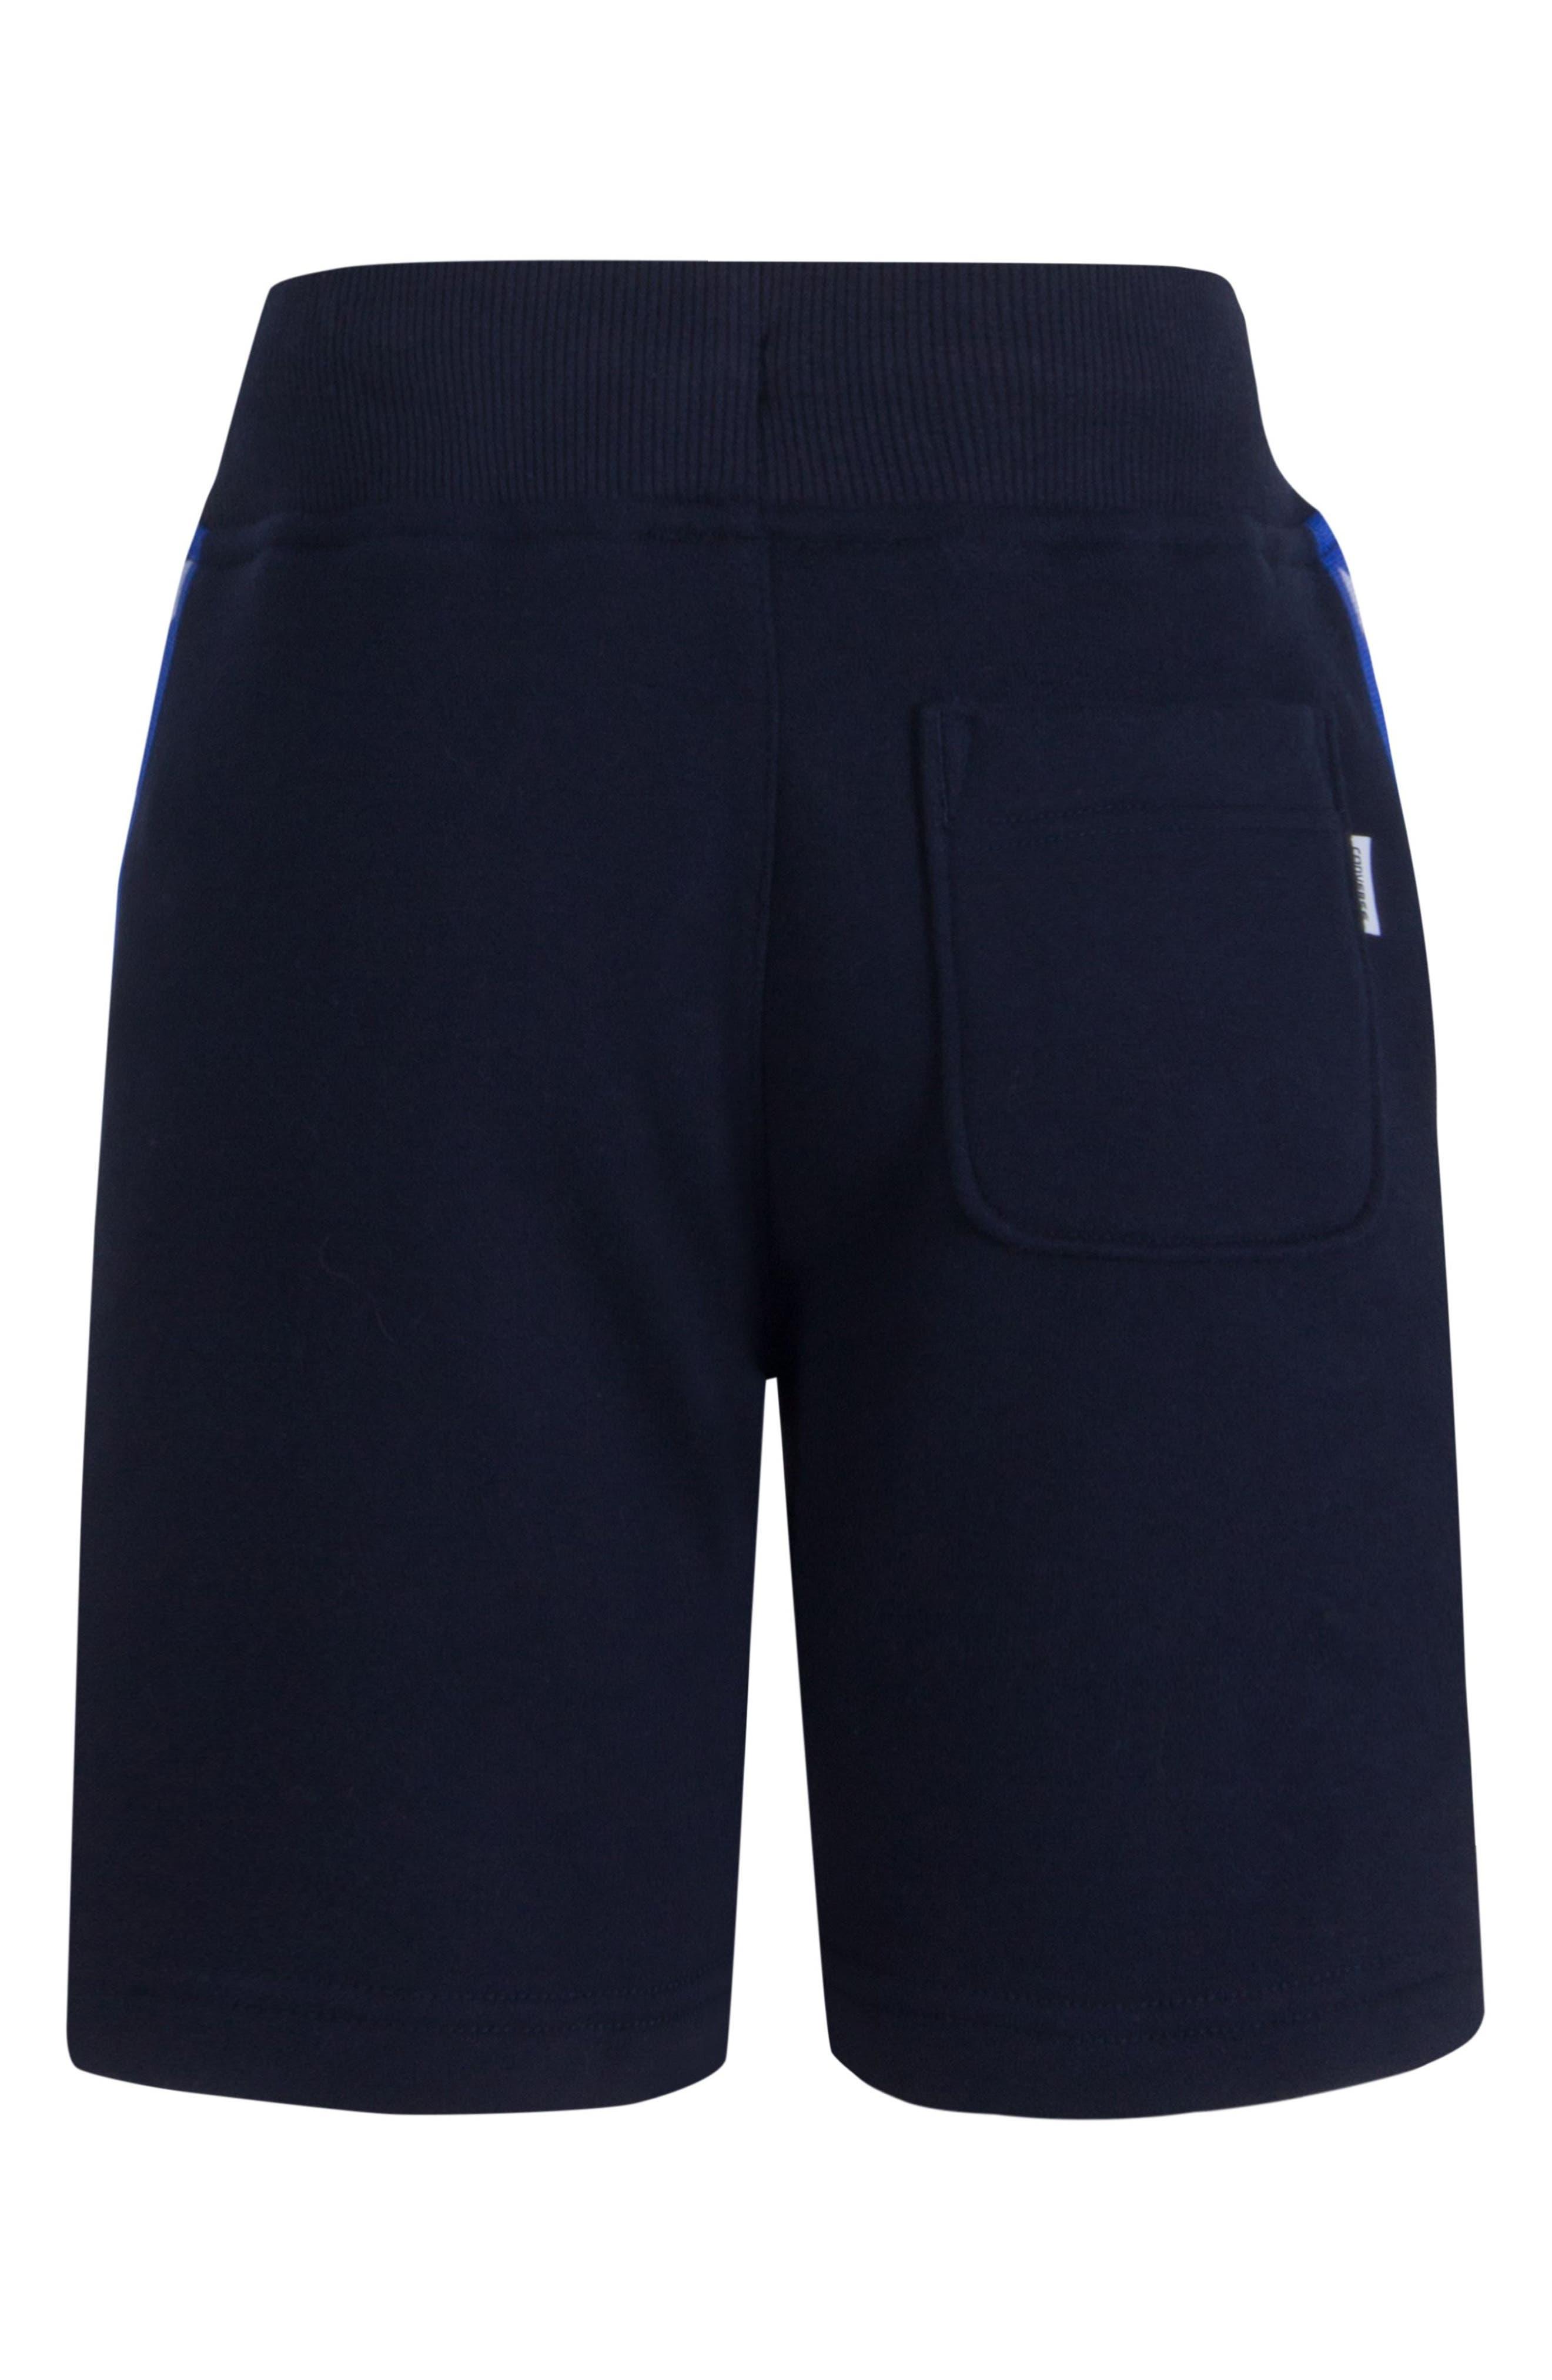 Star Knit Shorts,                             Alternate thumbnail 2, color,                             Obsidian